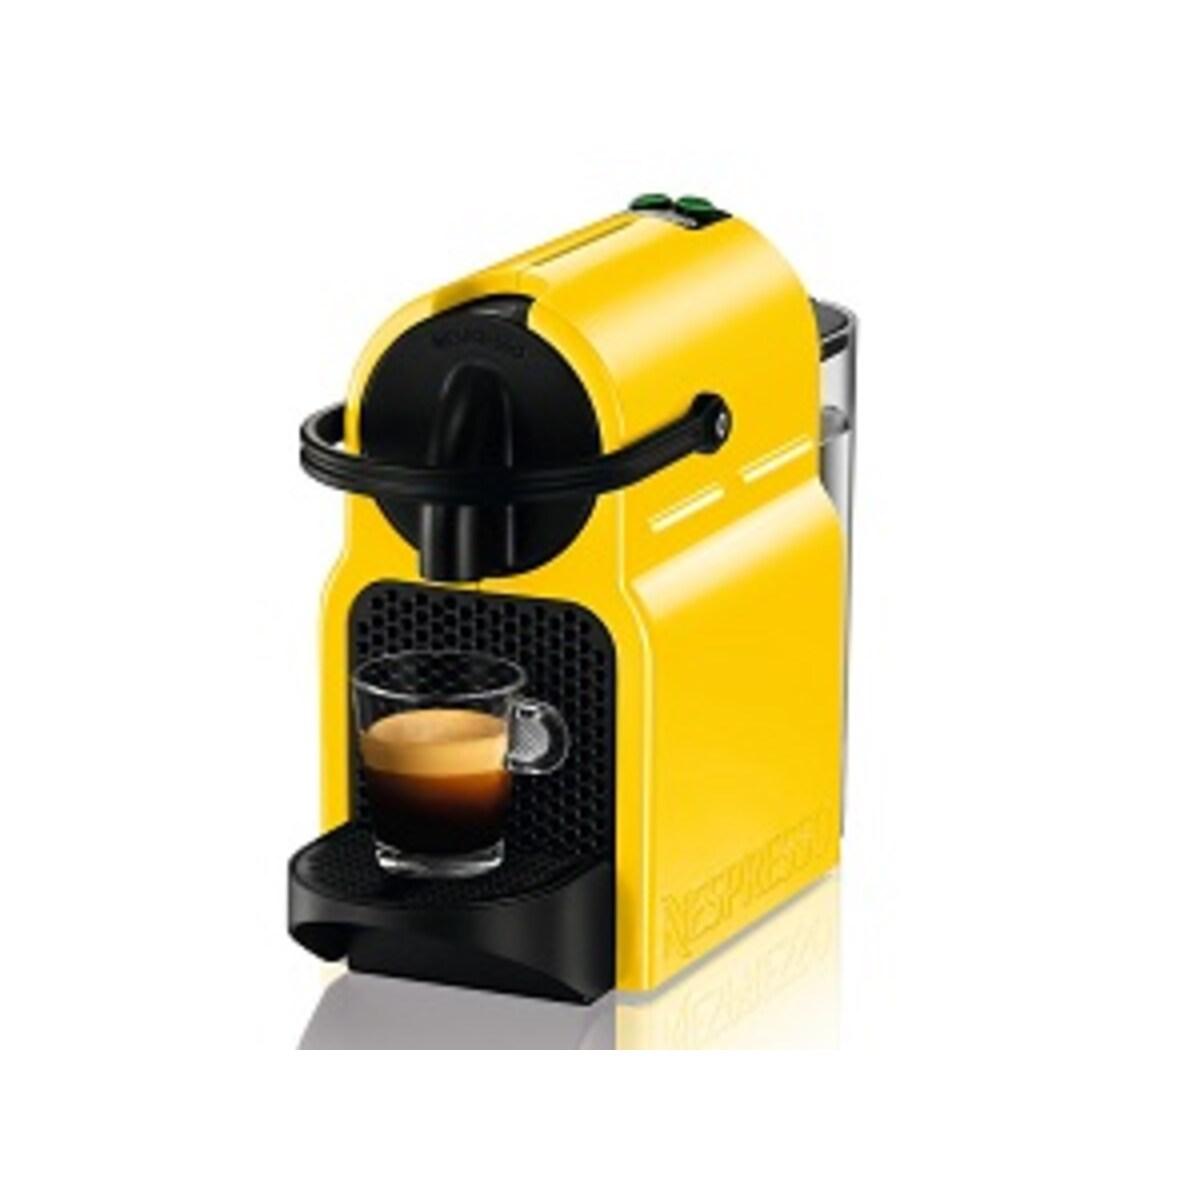 Nespresso Inissia EN80.YE Canary Yellow